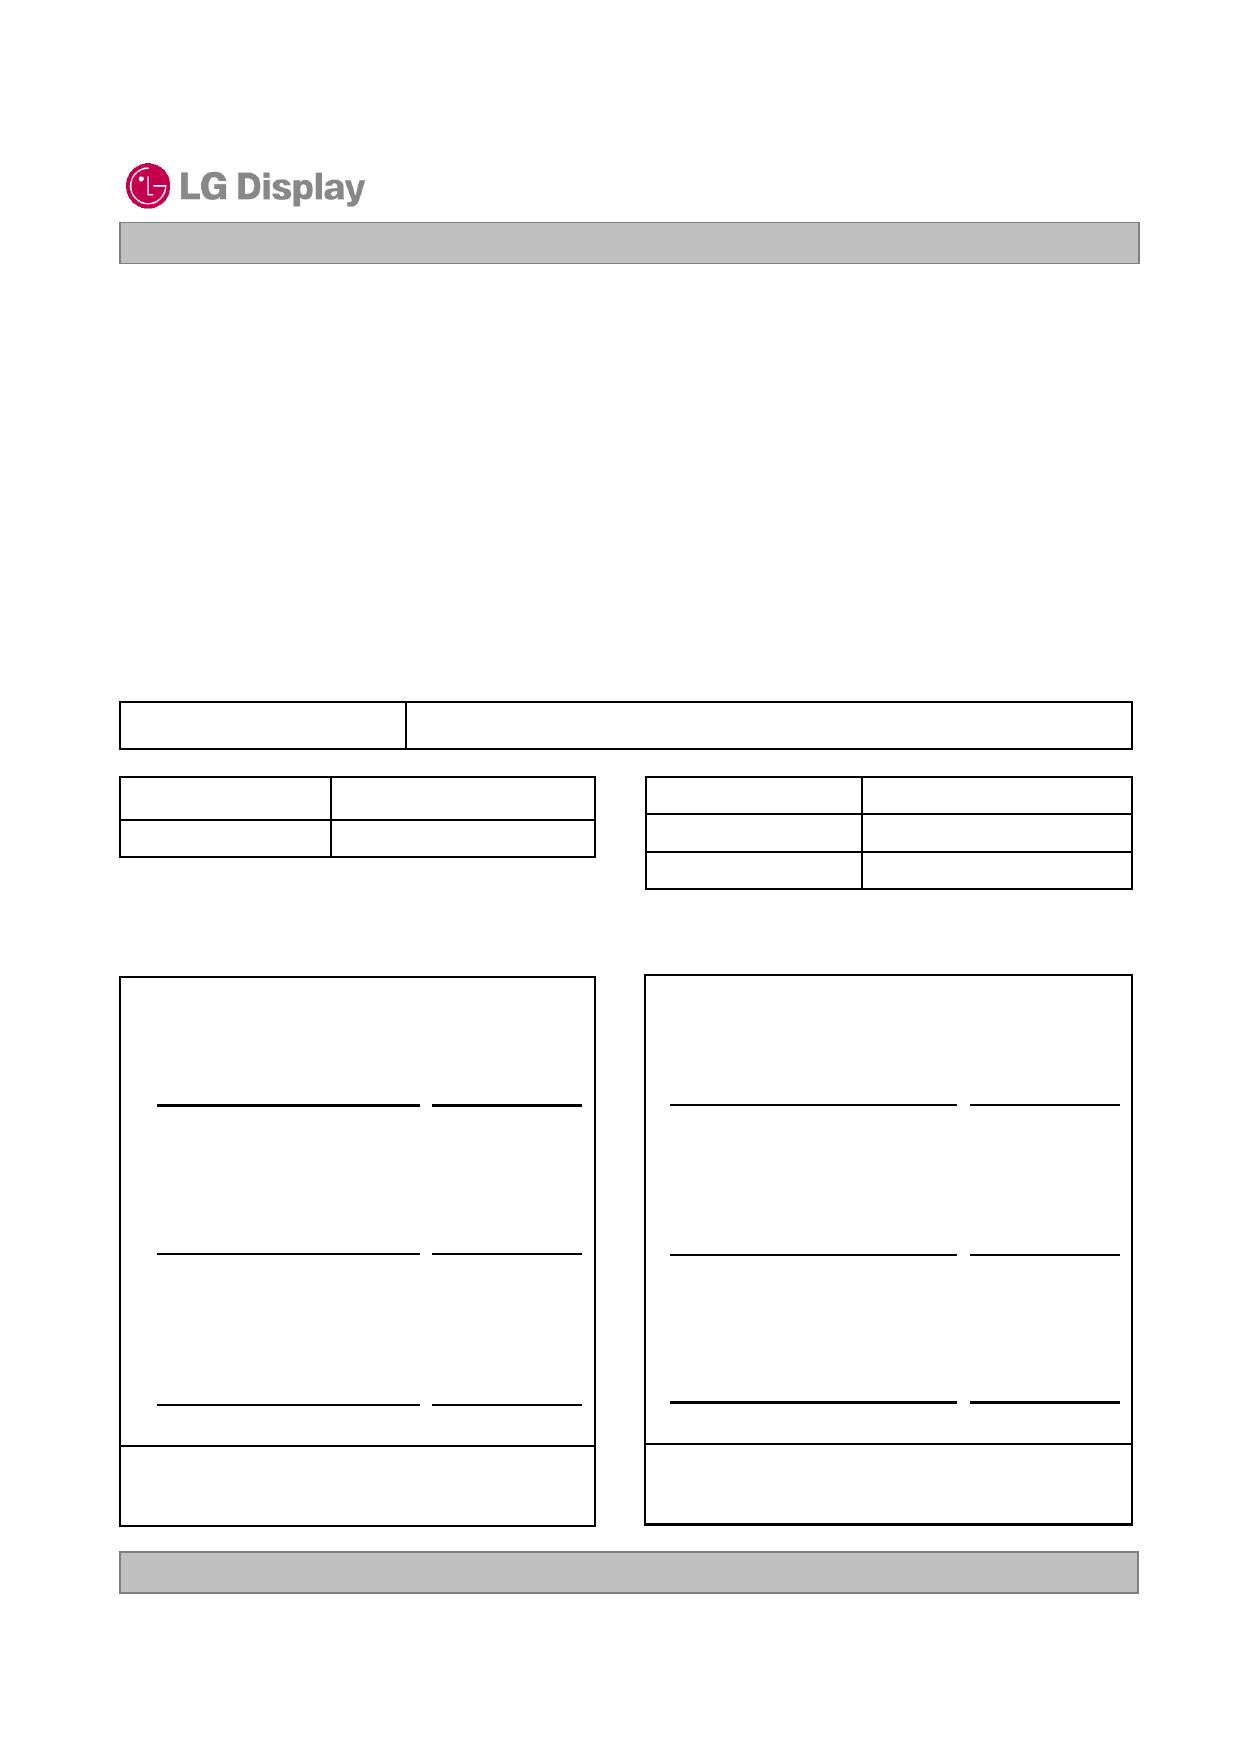 LC320WXN-SCA1 datasheet